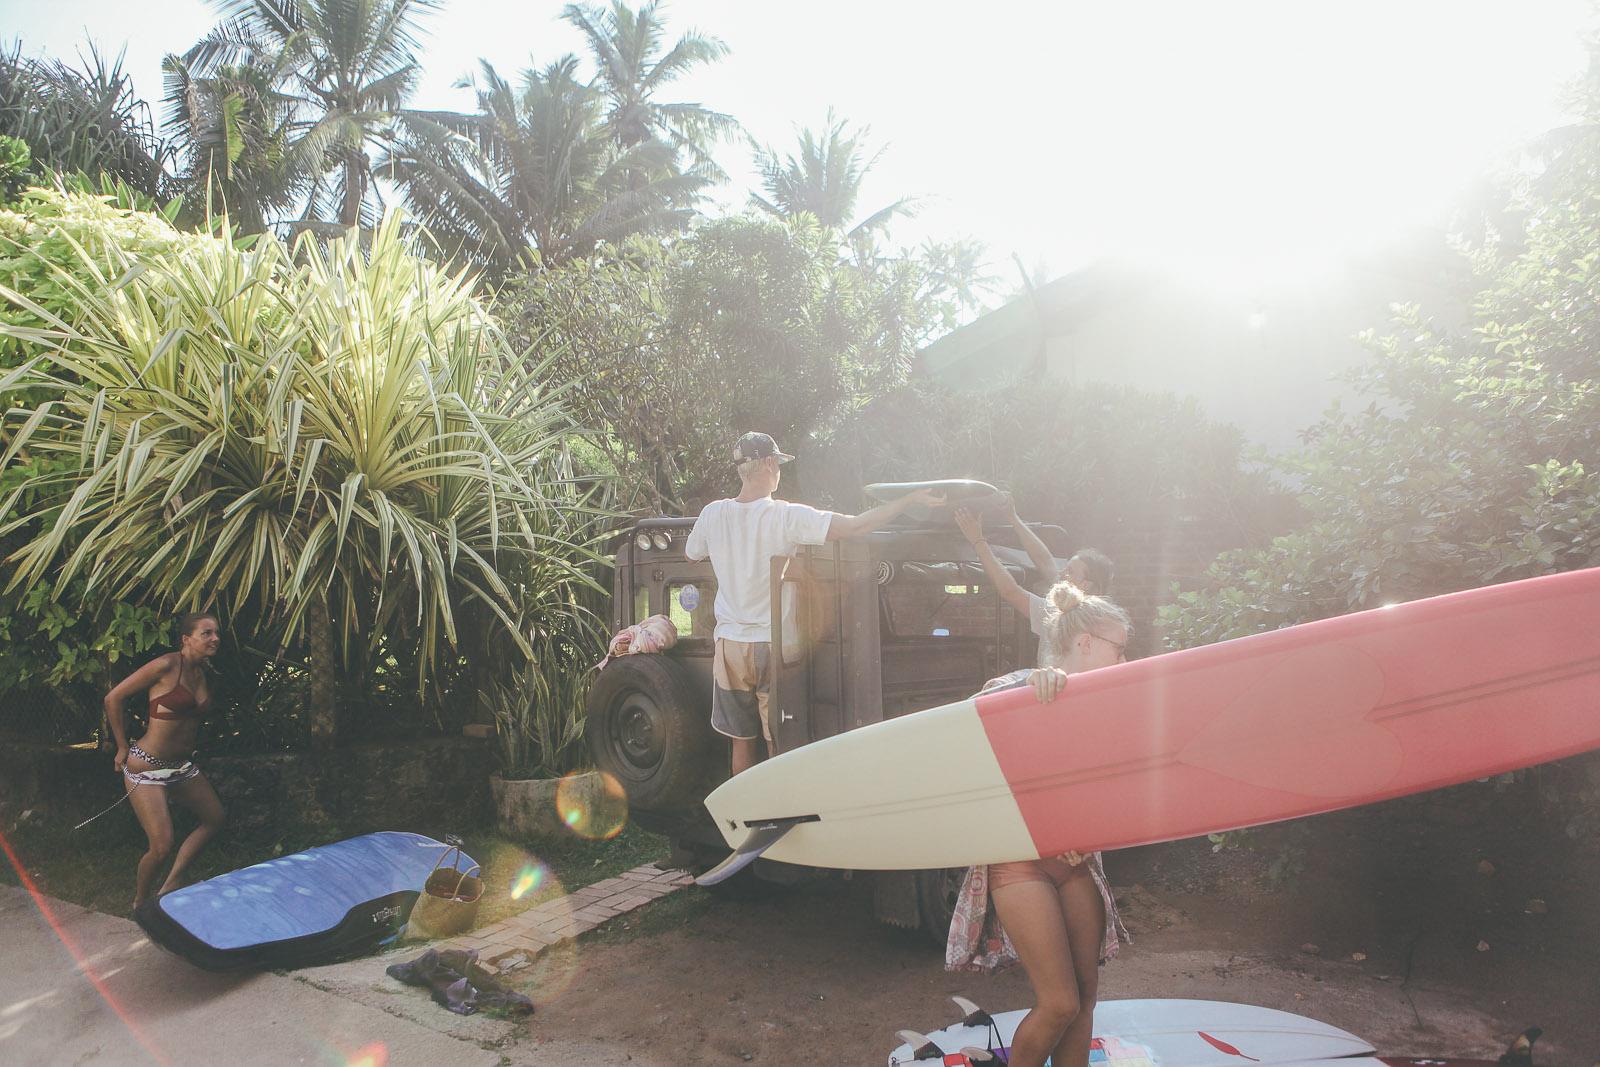 Sunshinestories-Sri-Lanka-Medawatta-Medawata-Meda-Watta-Mada-surf-Lonboard-Surfing-Wave-Surf-School-Camp-Yoga-Studio-IMG_0777.jpg